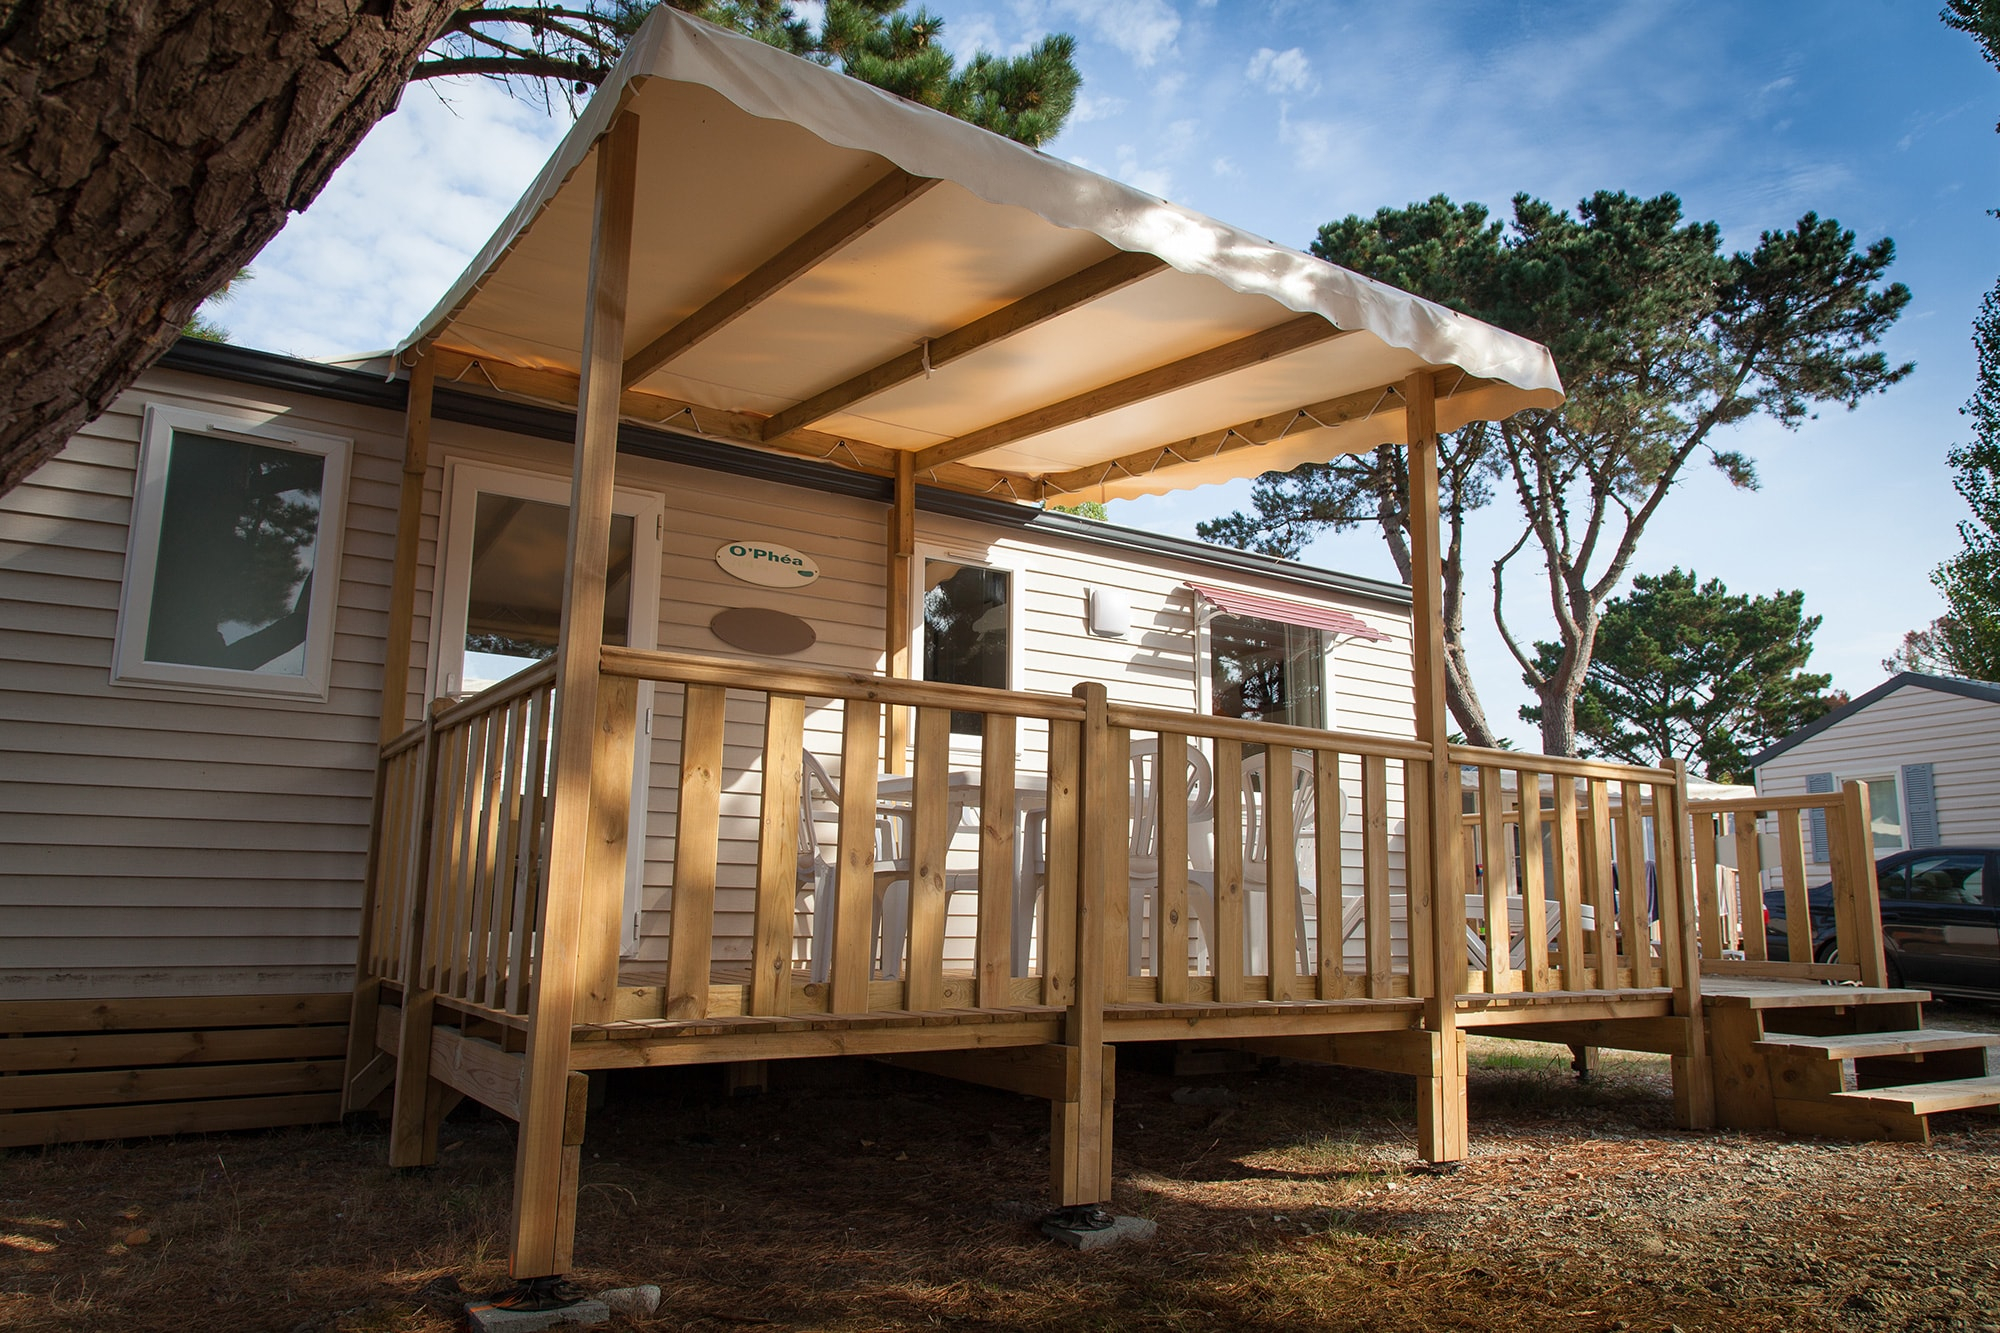 Couverture terrasse mobil home Toiture Pergola Mobil